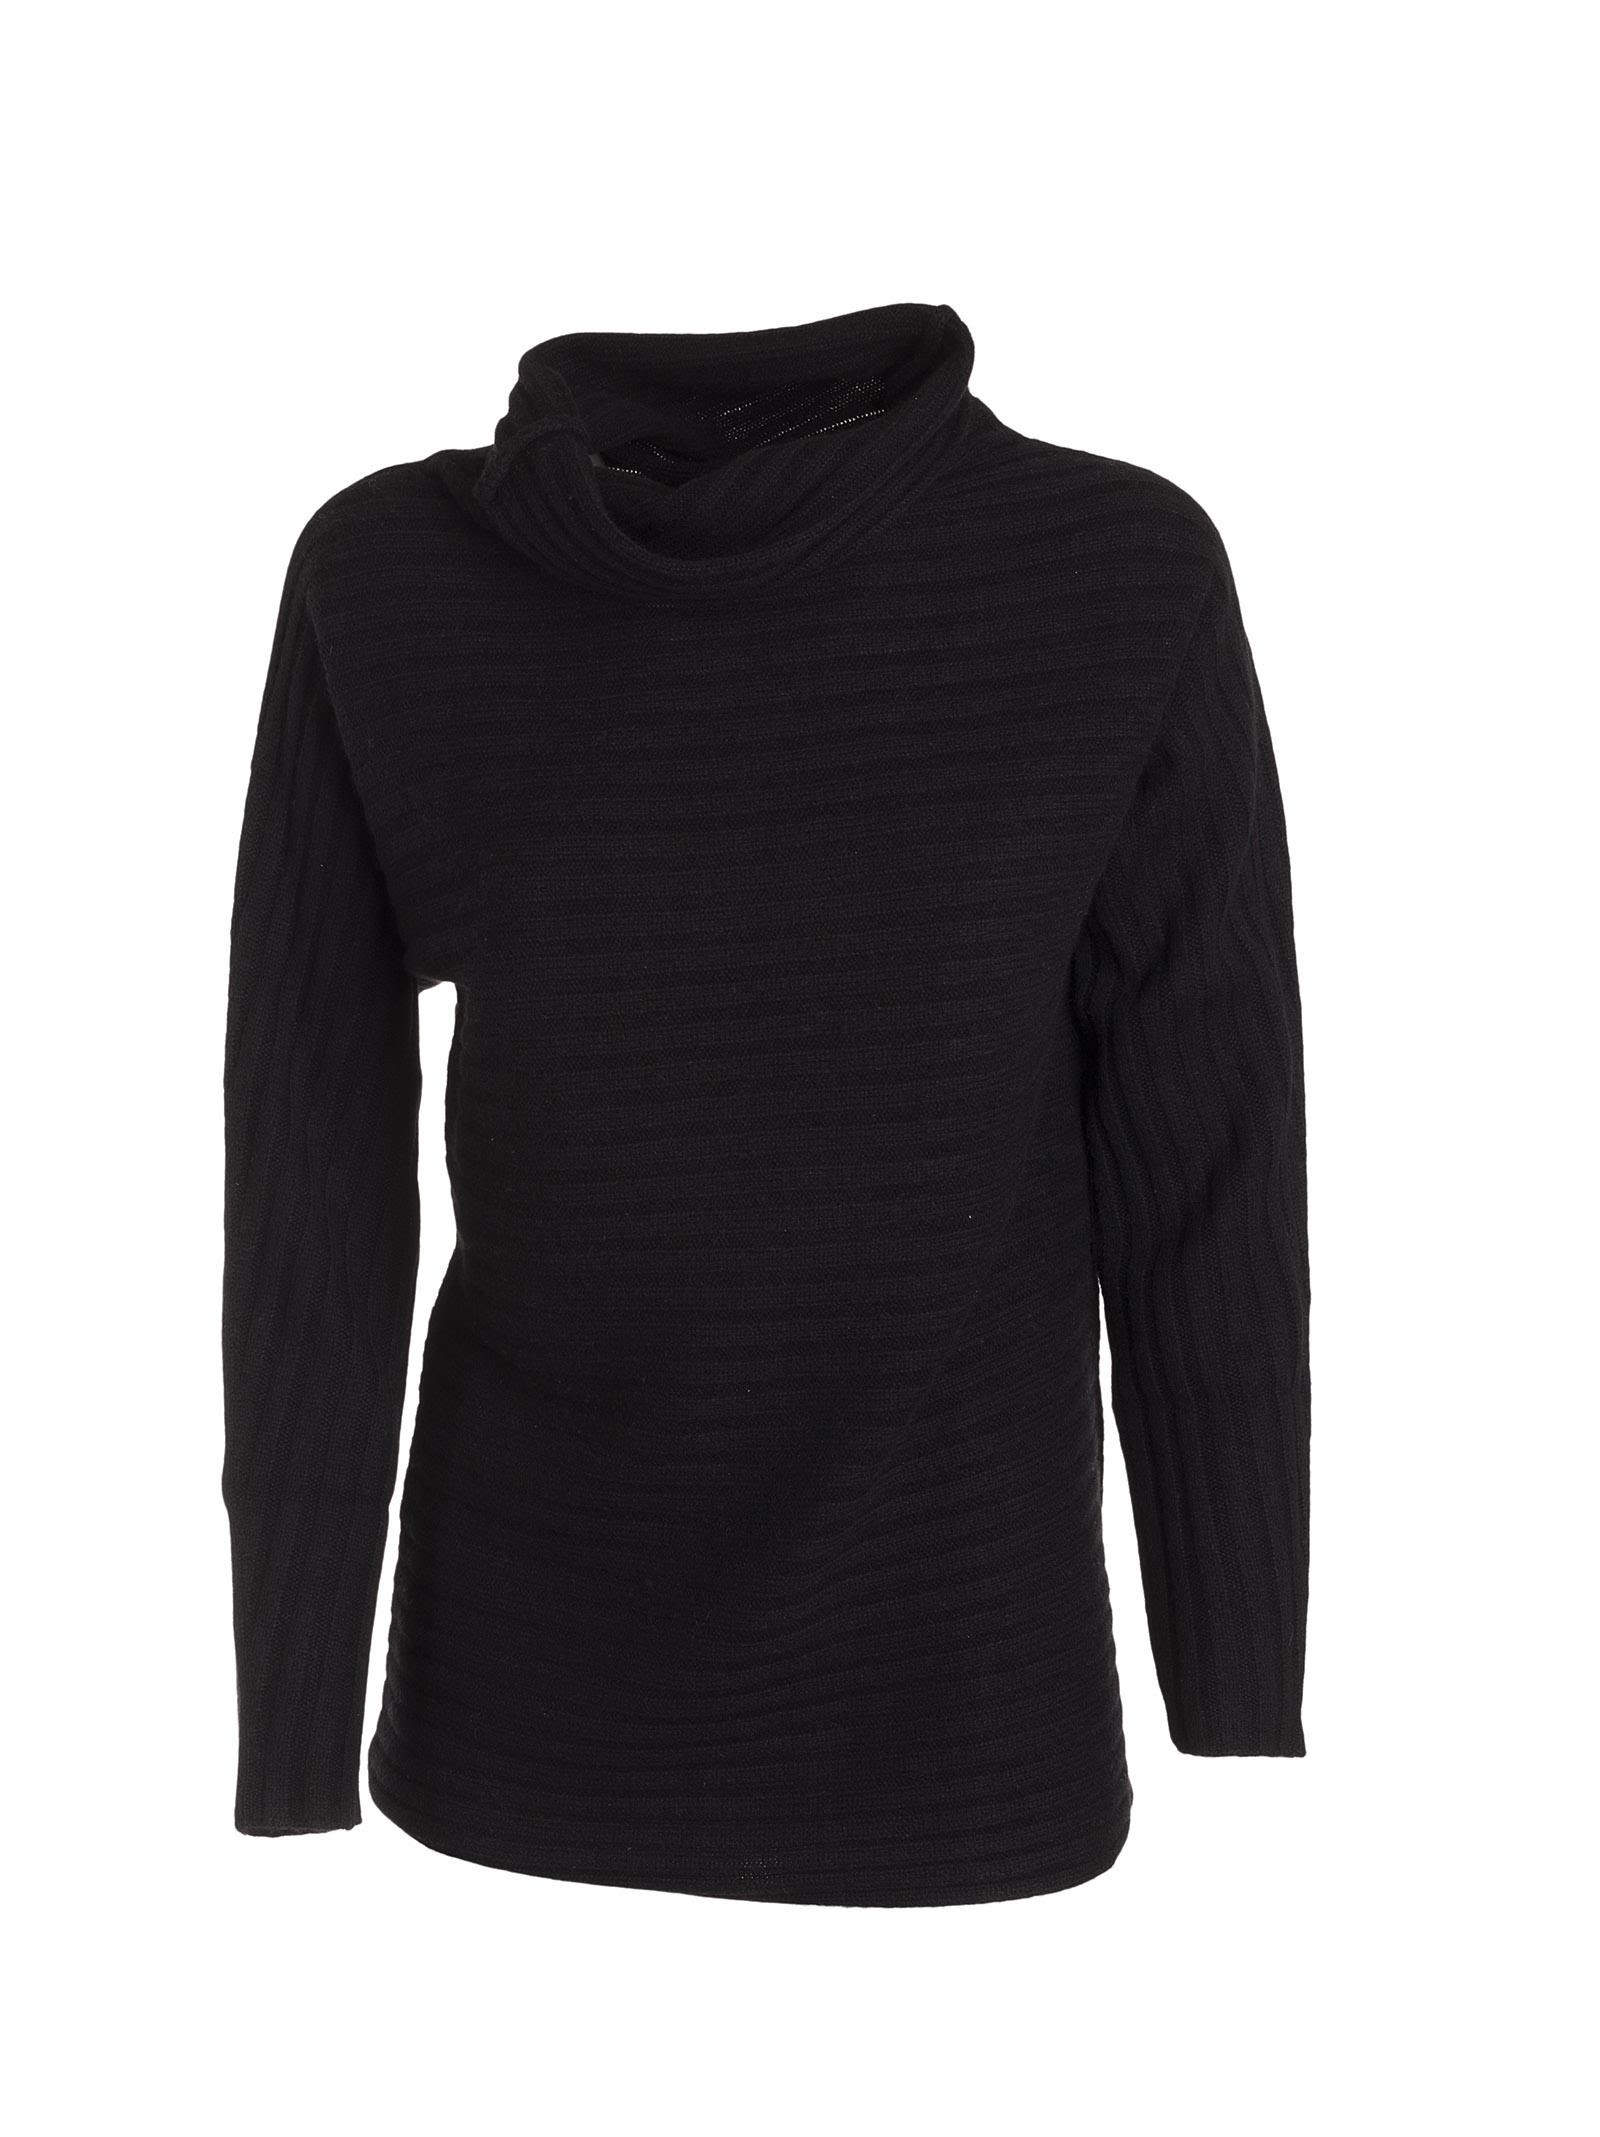 Max Mara - Max Mara Turtleneck Sweater - Black, Women's Sweaters ...